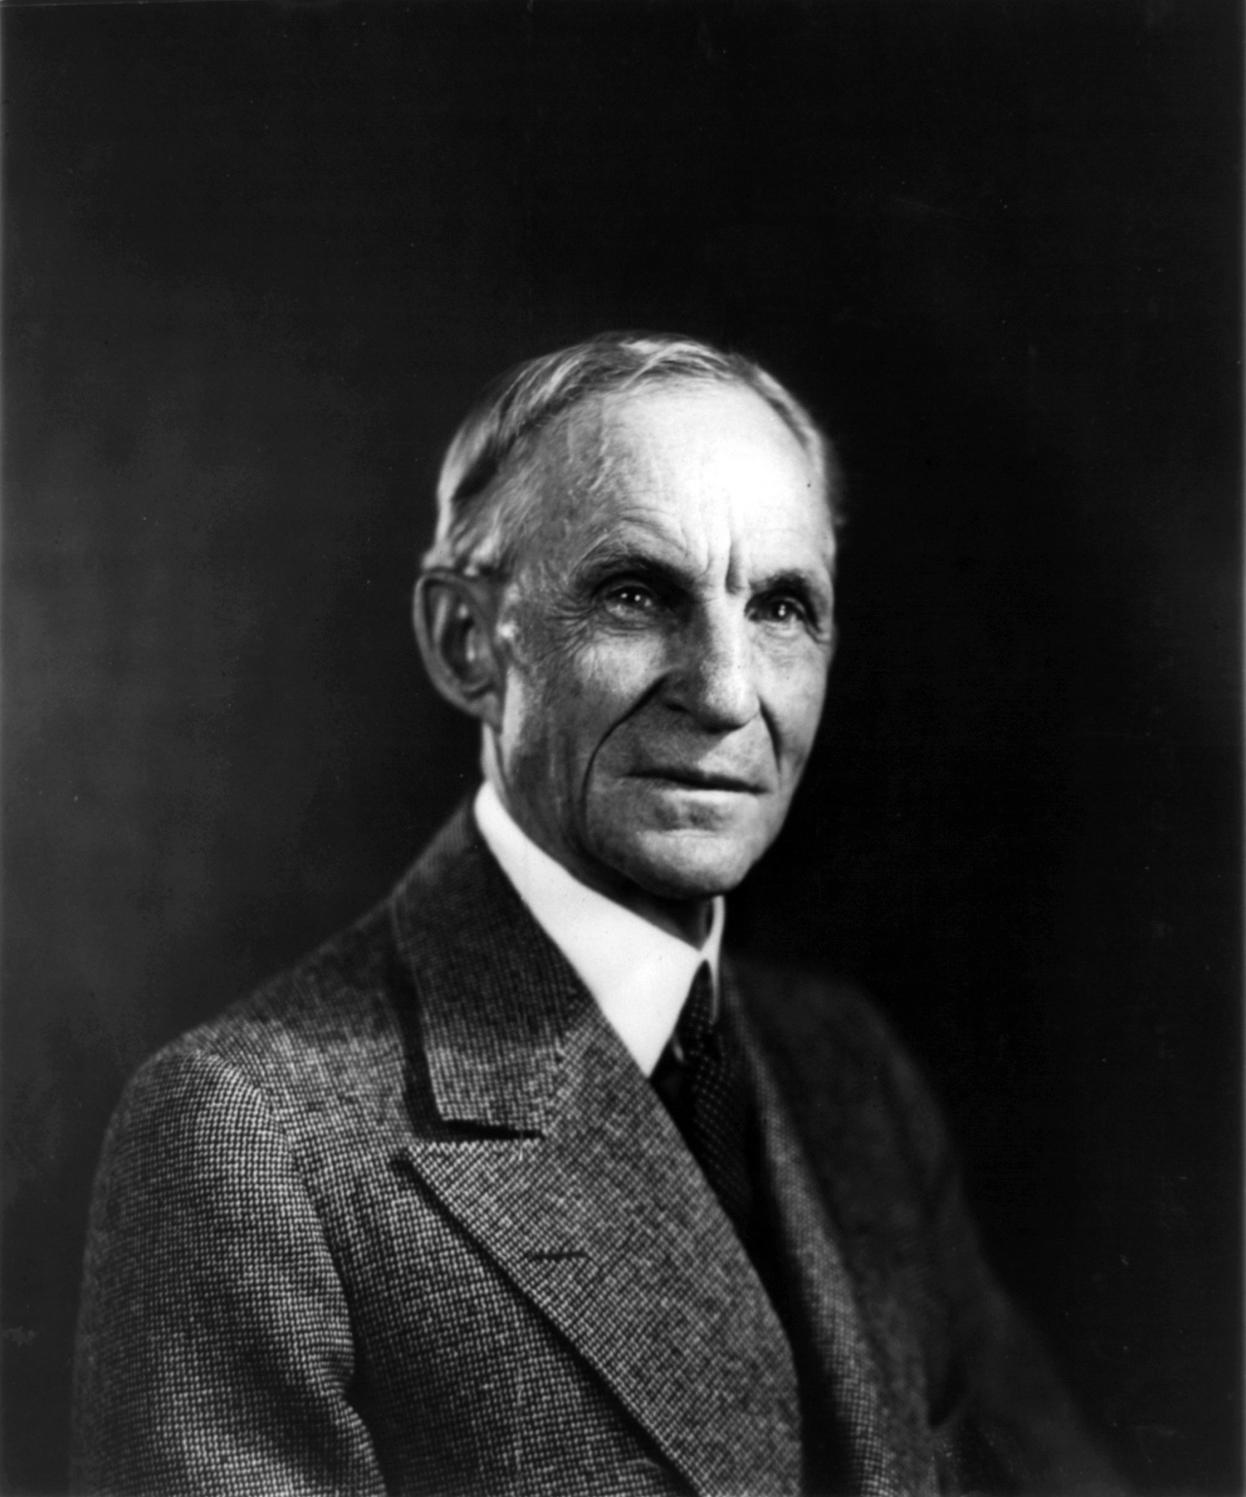 File Henry Ford Cph 3b34530 Jpg Wikimedia Commons